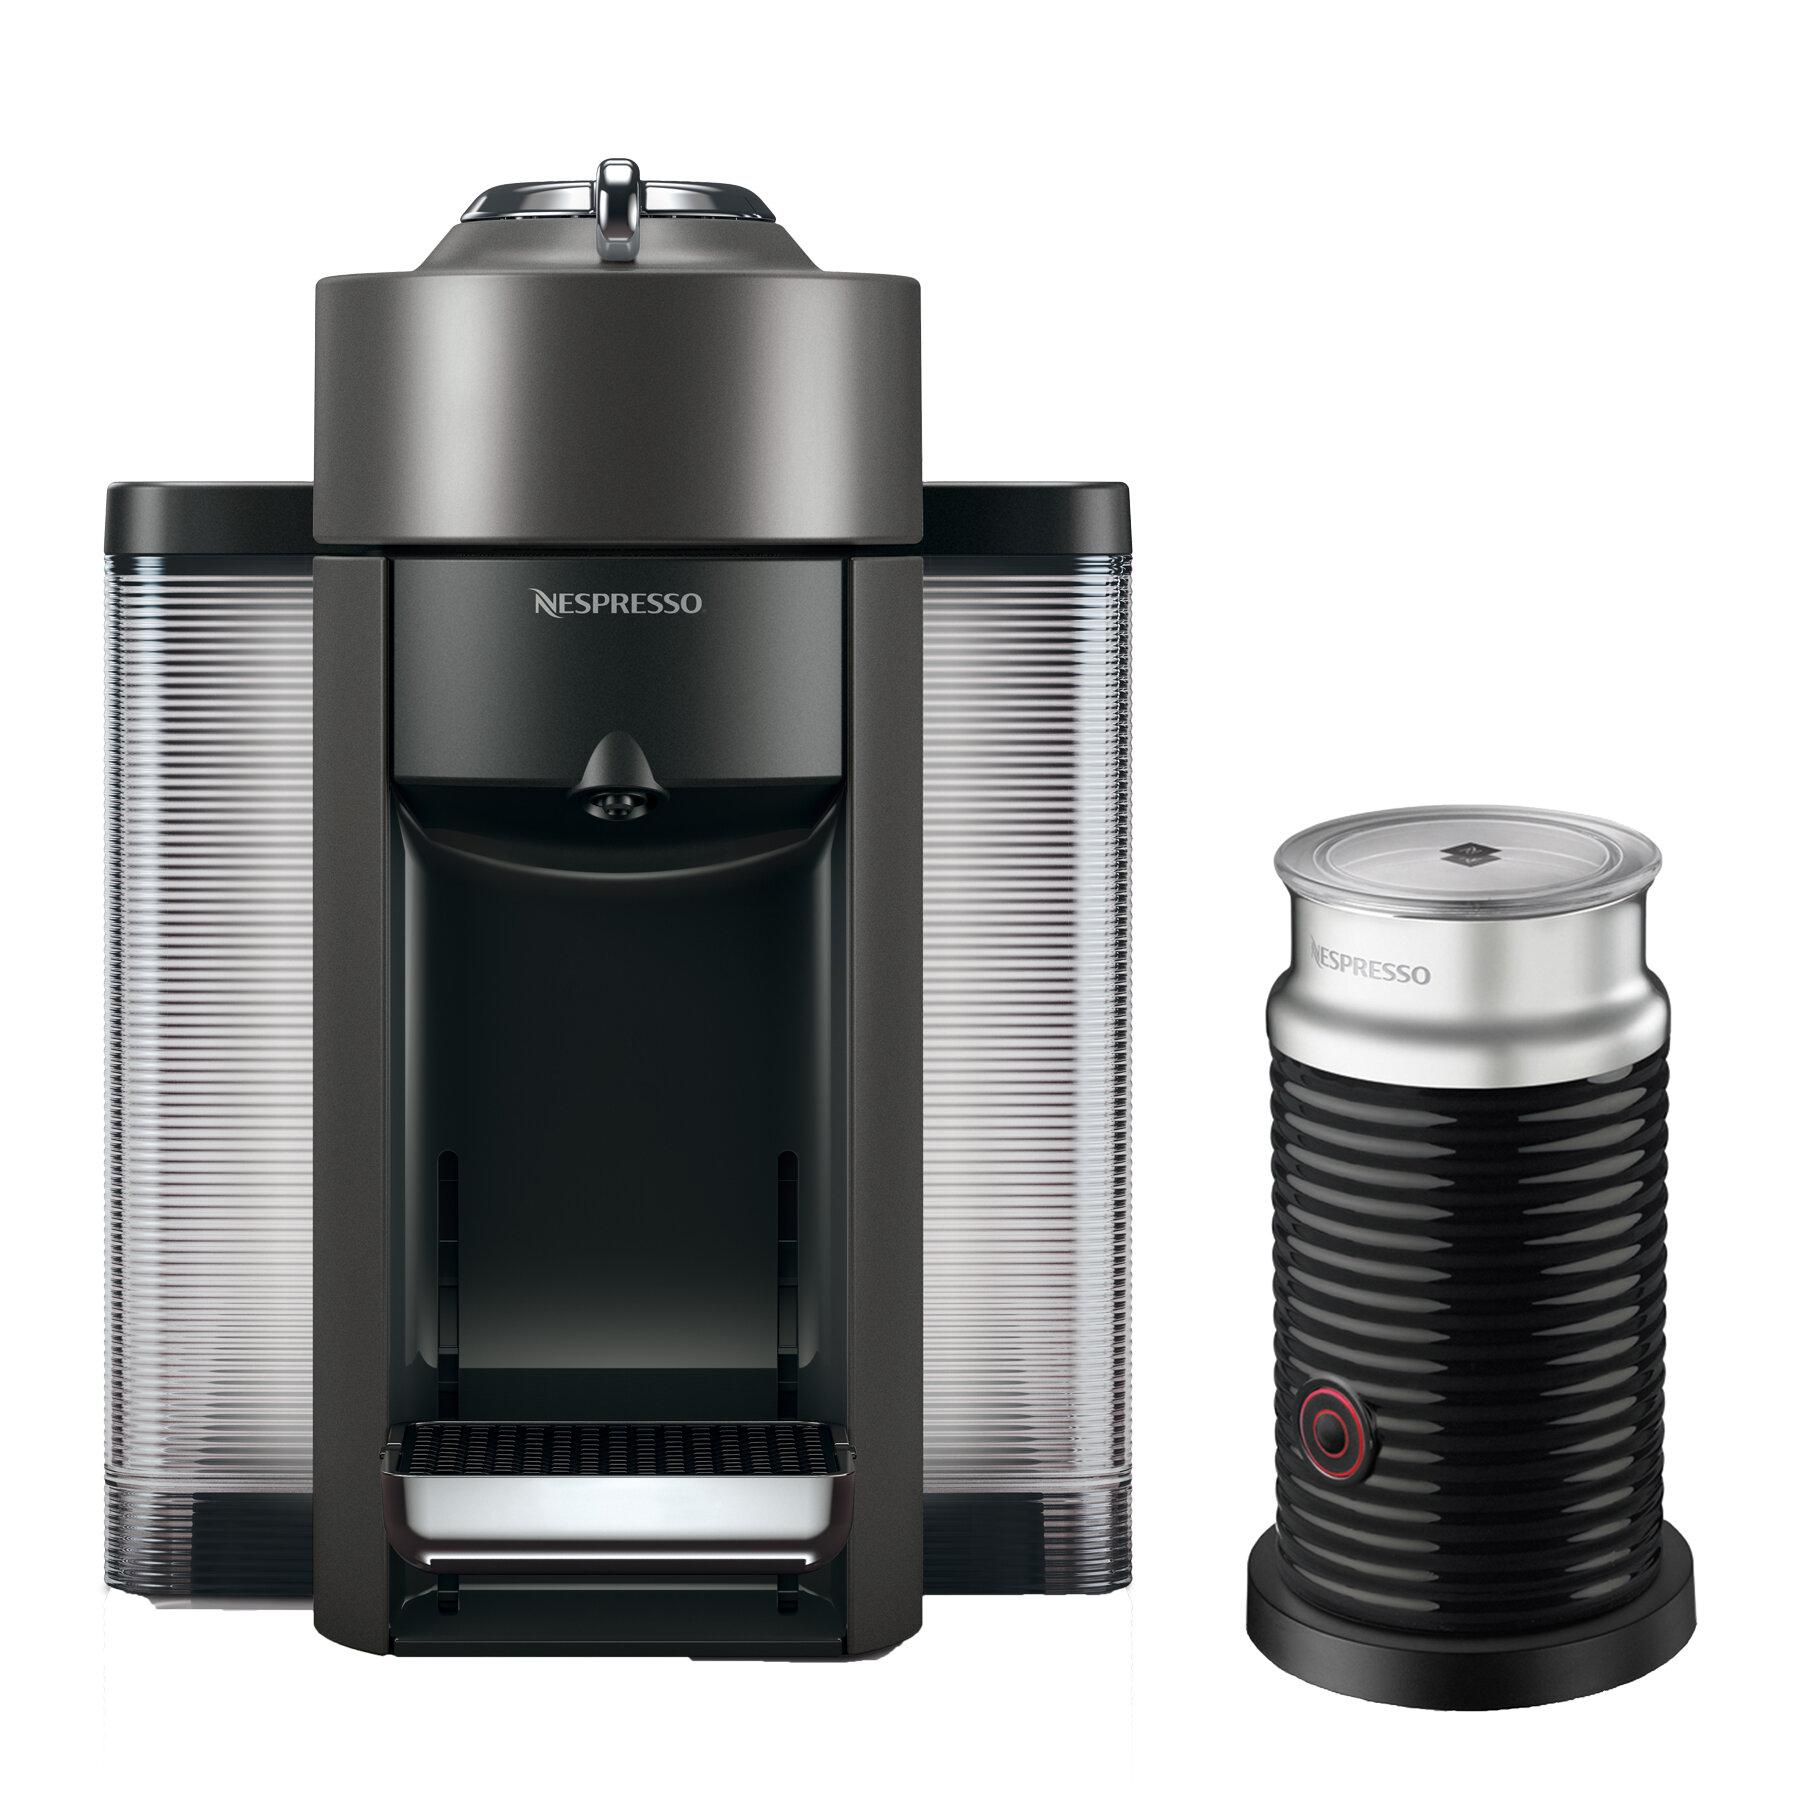 Nespresso DeLonghi Vertuo Coffee And Espresso Single Serve Machine With Aeroccino Milk Frother Reviews